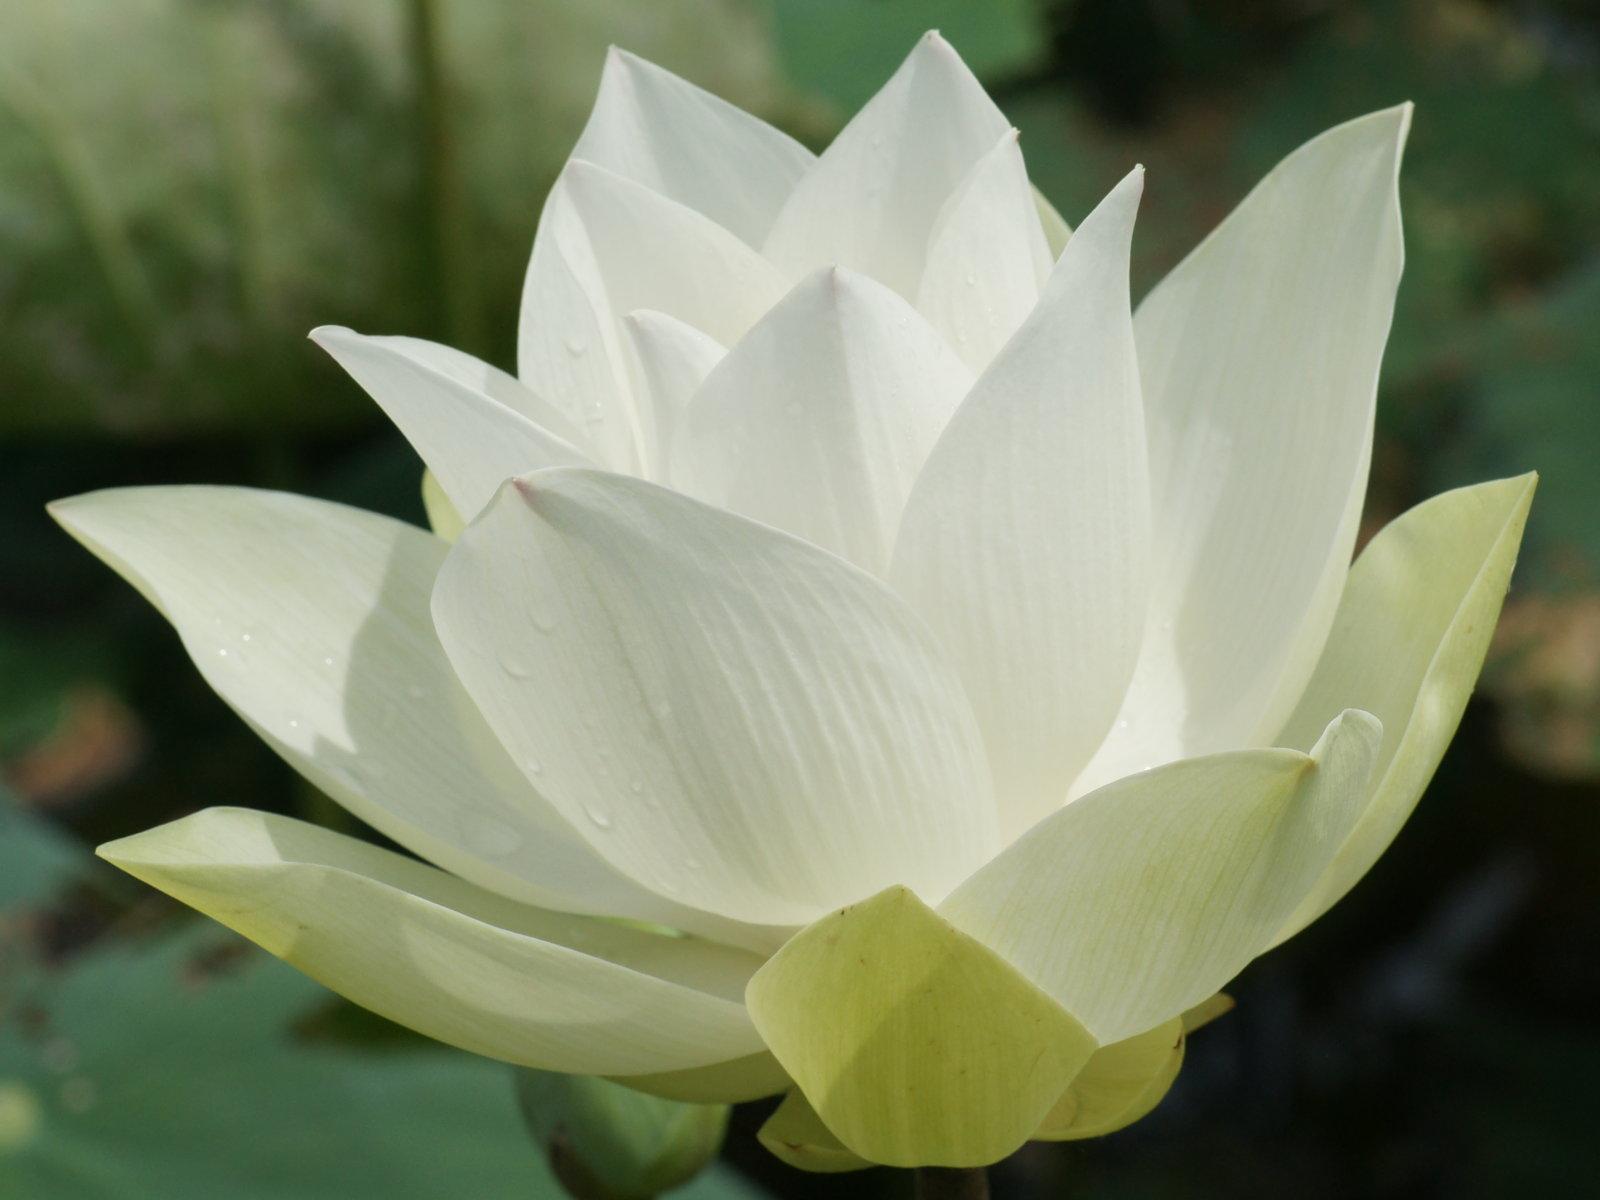 Hoa sen trắng đẹp nhất